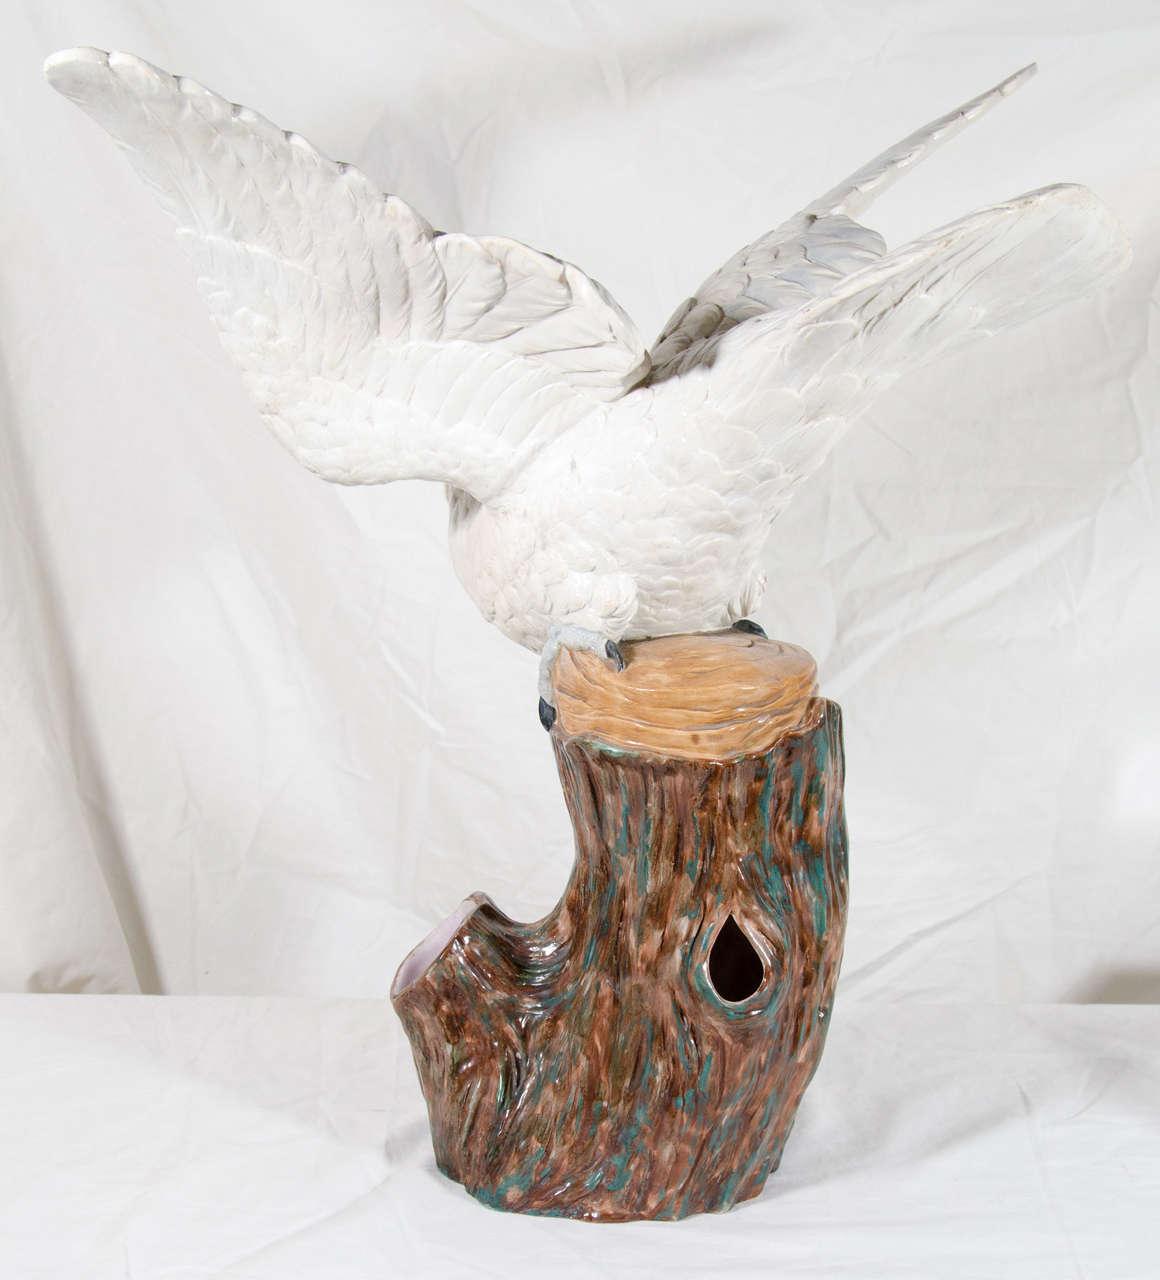 Large Antique Porcelain Cockatoo Sculpture Royal Worcester Made circa 1870 For Sale 2